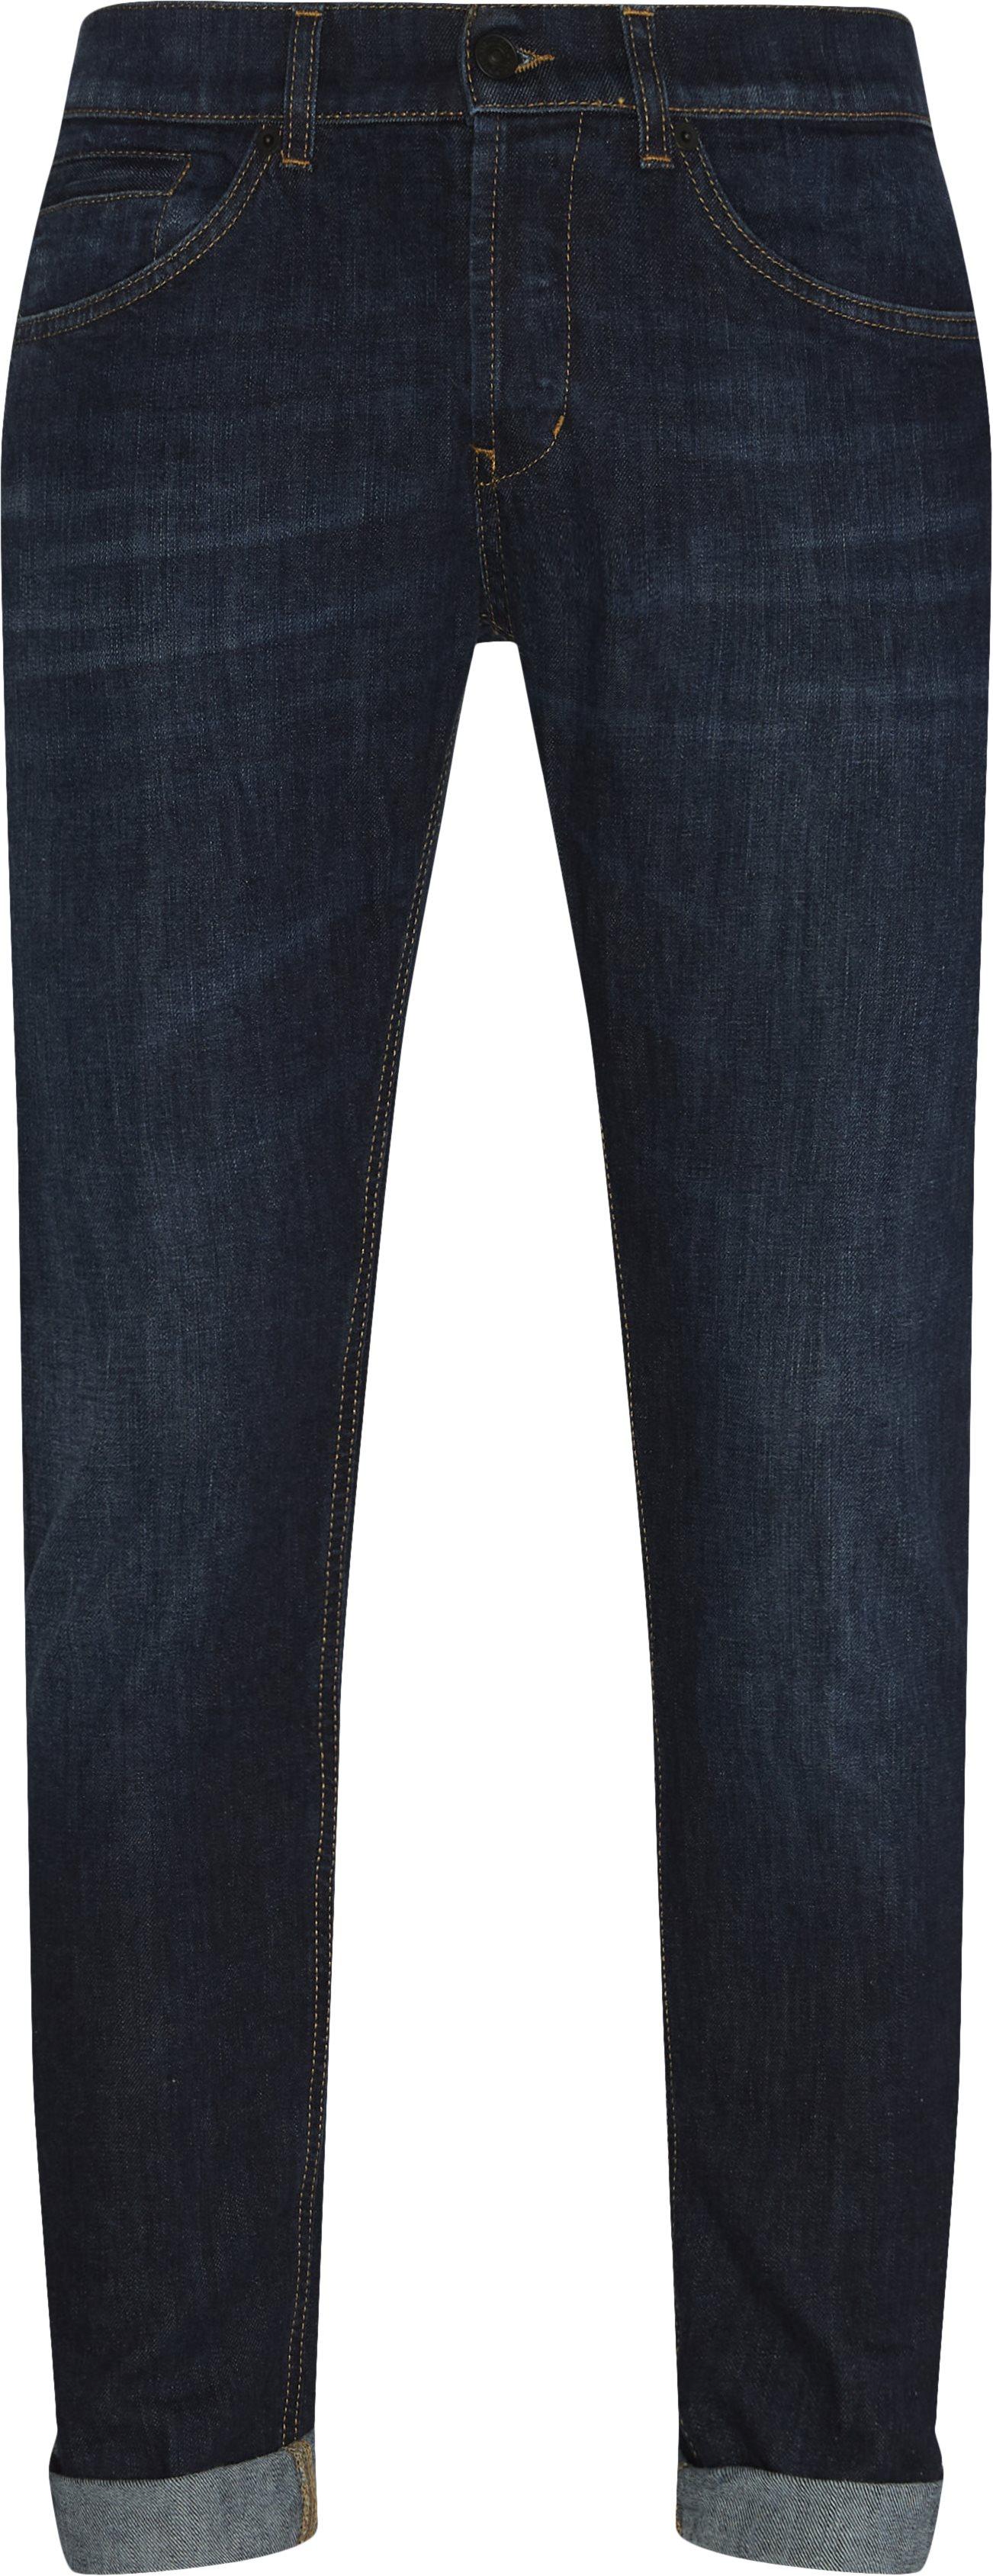 George Jeans - Jeans - Slim fit - Blå